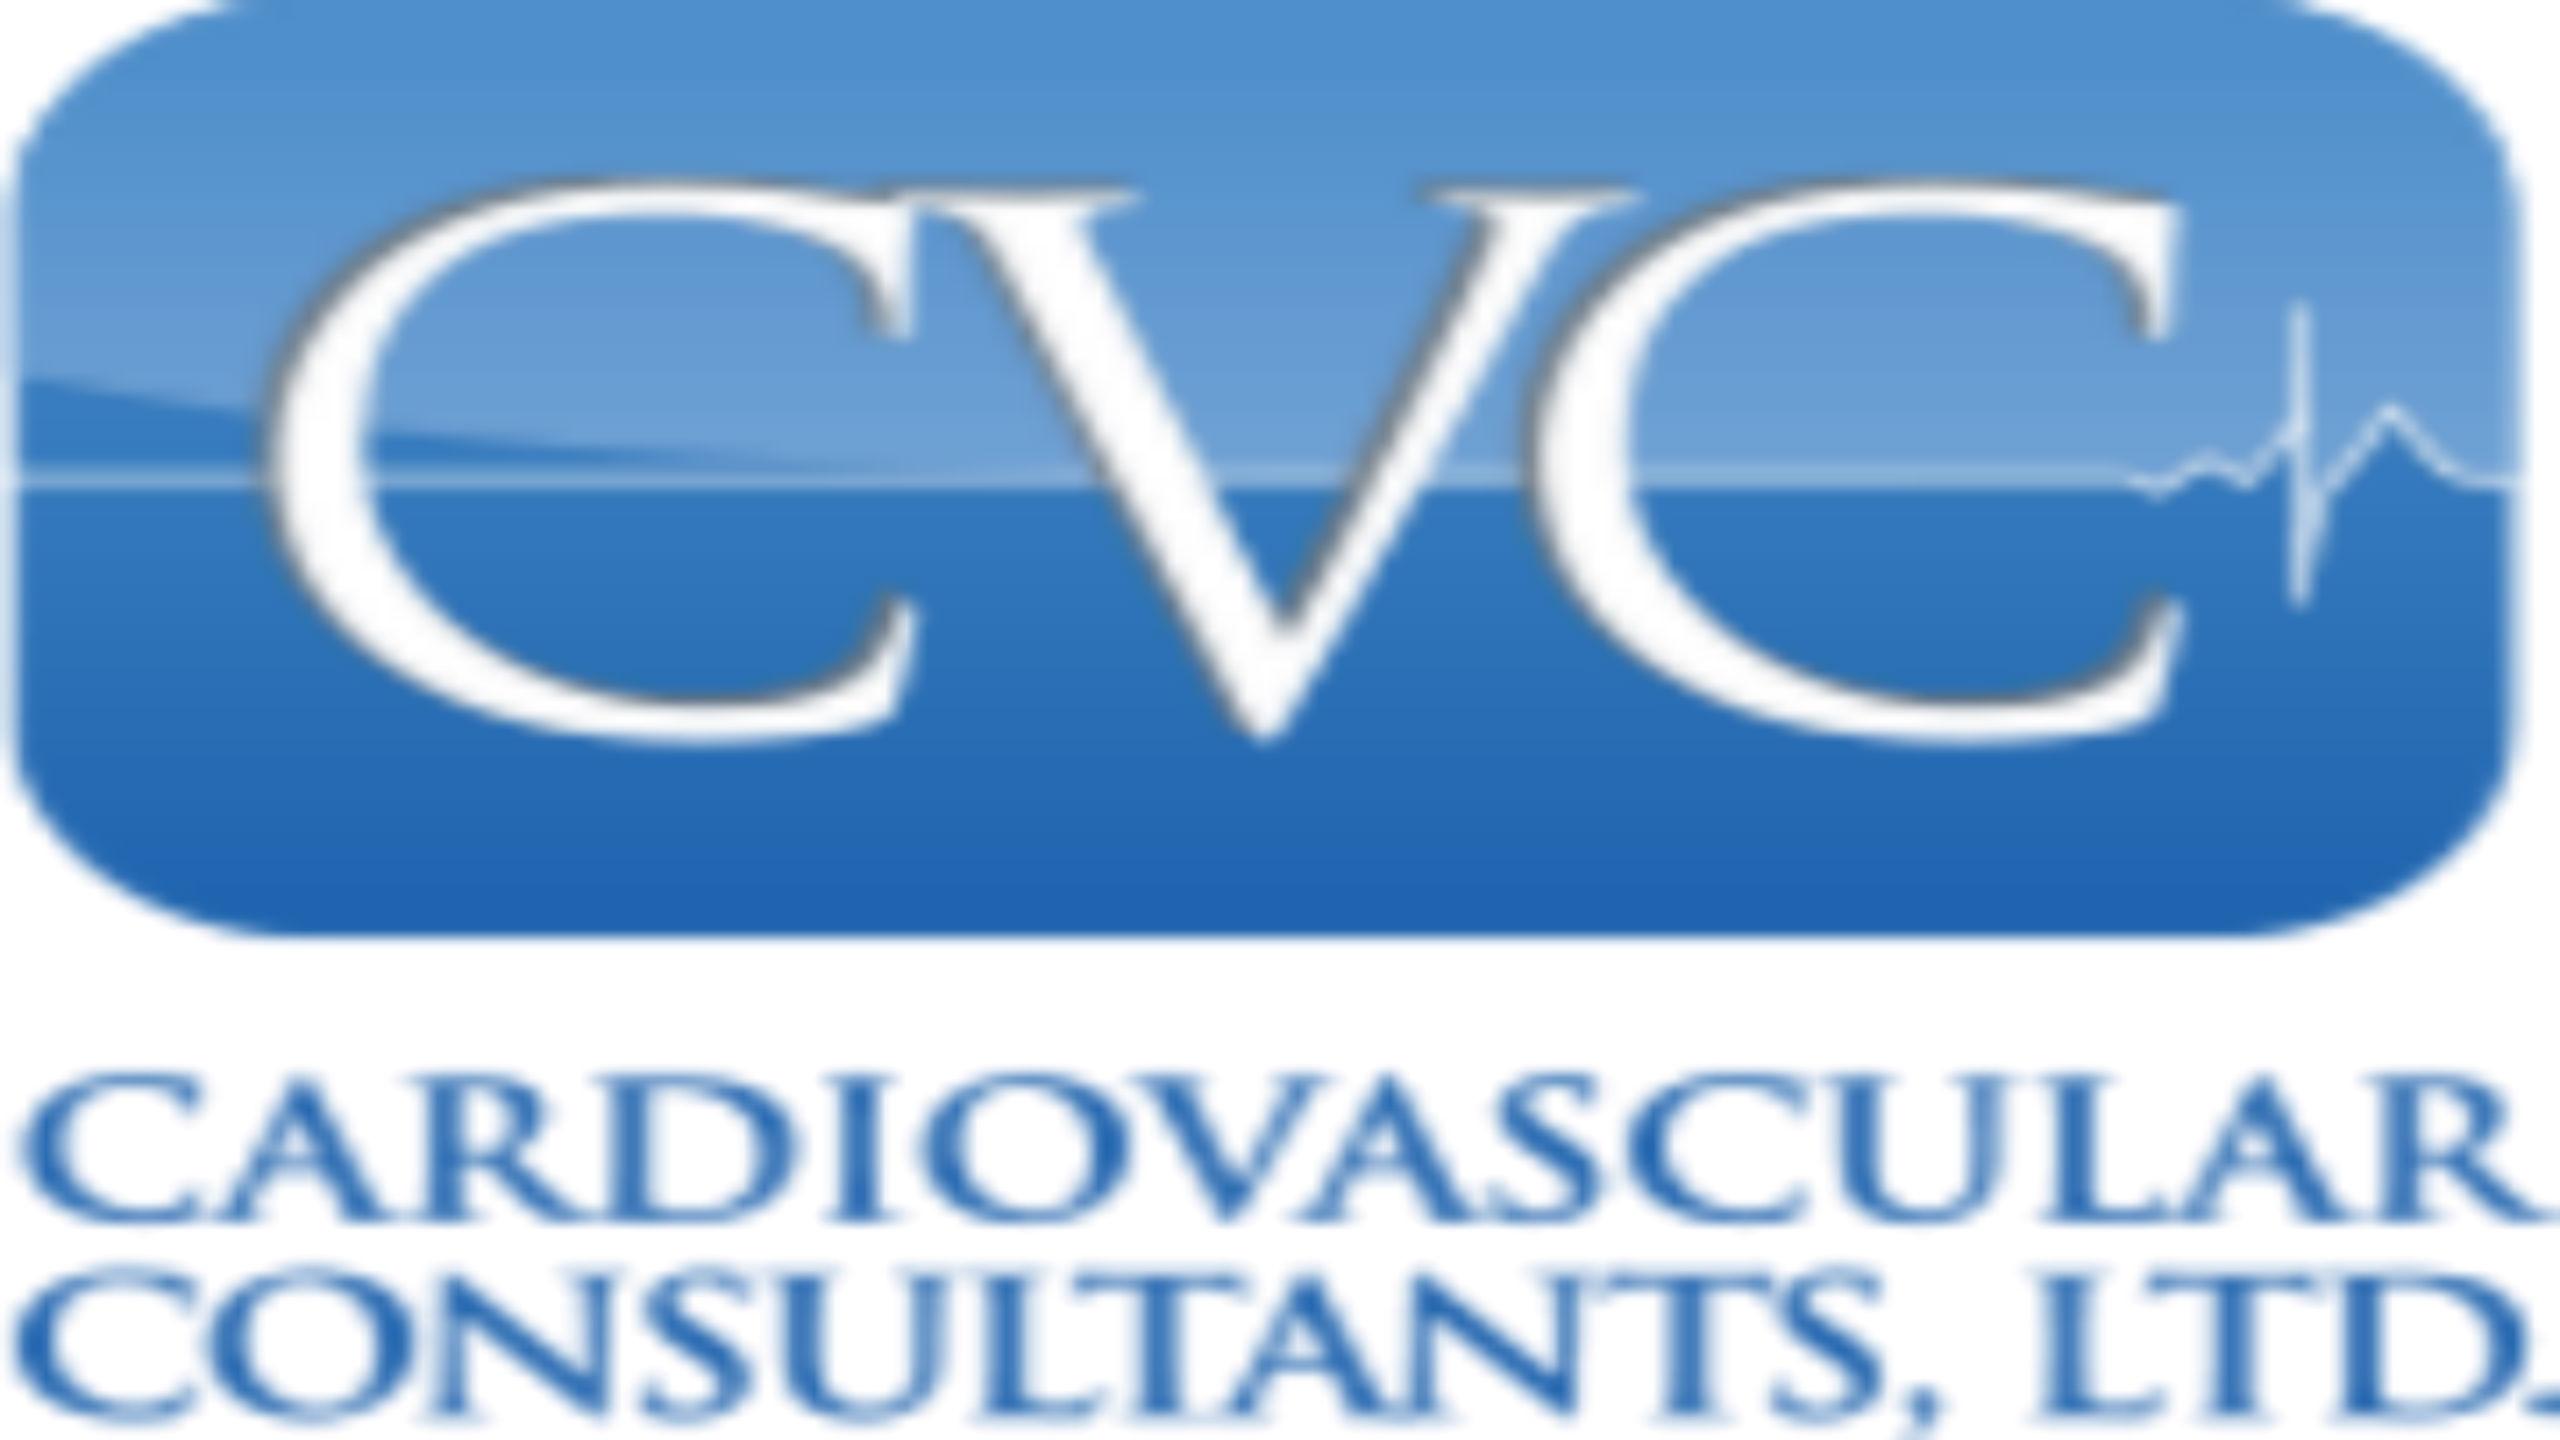 Cardiovascular Consultants LTD (@cvcheart) Cover Image